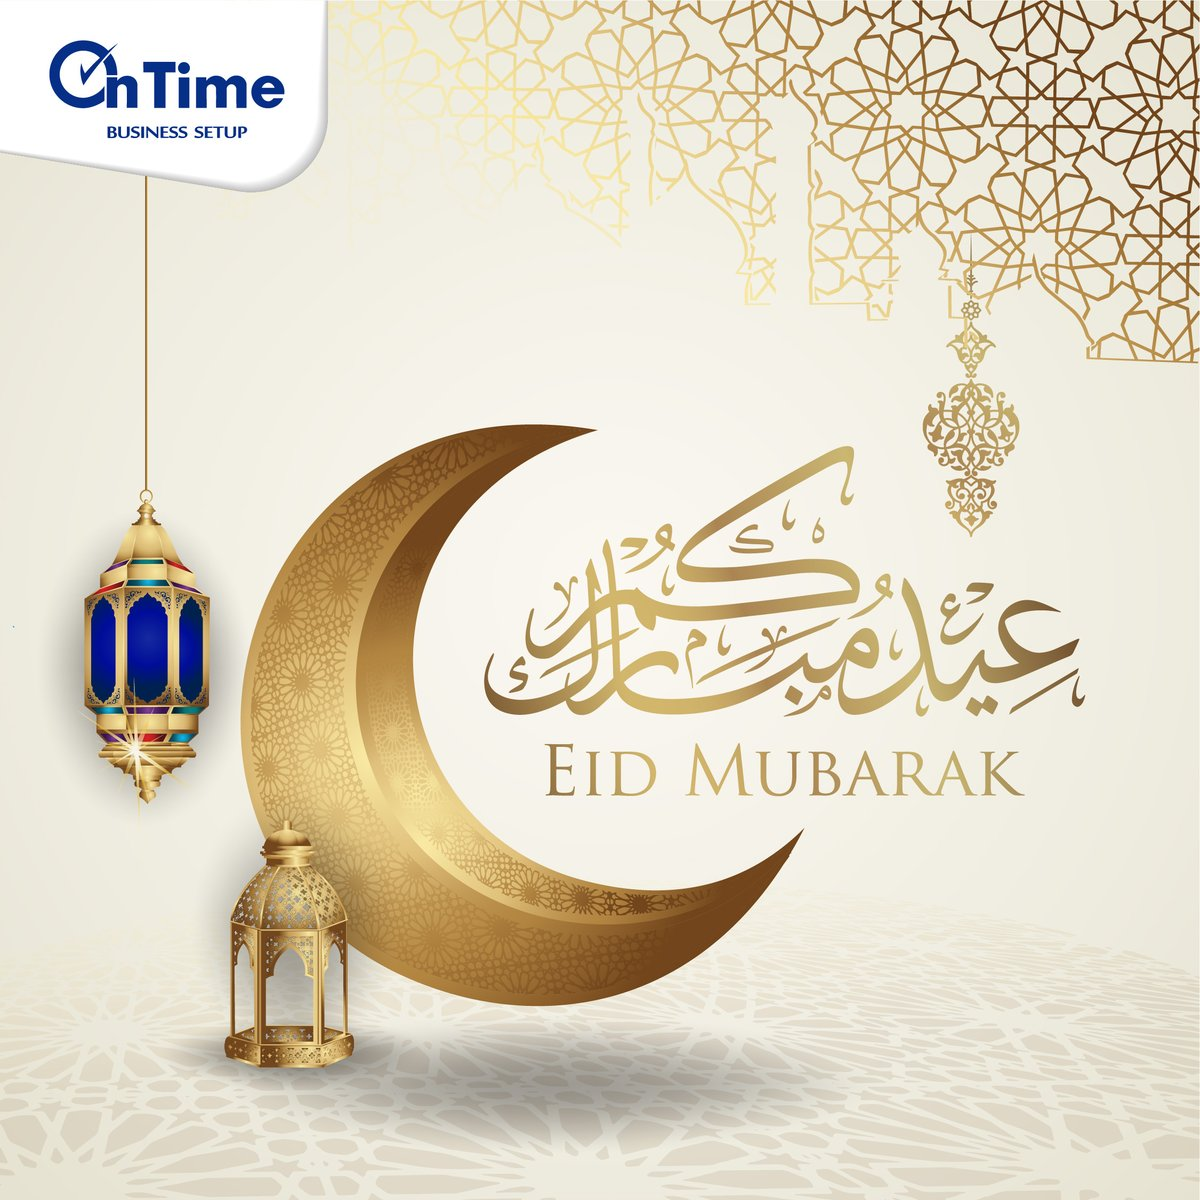 We wish you a very happy Eid, and may all your good deeds be accepted by God #EIdMubarak #EidDay #Eid2020 #HappyEid #OnTimeFamily https://t.co/QrOmYhRcFi